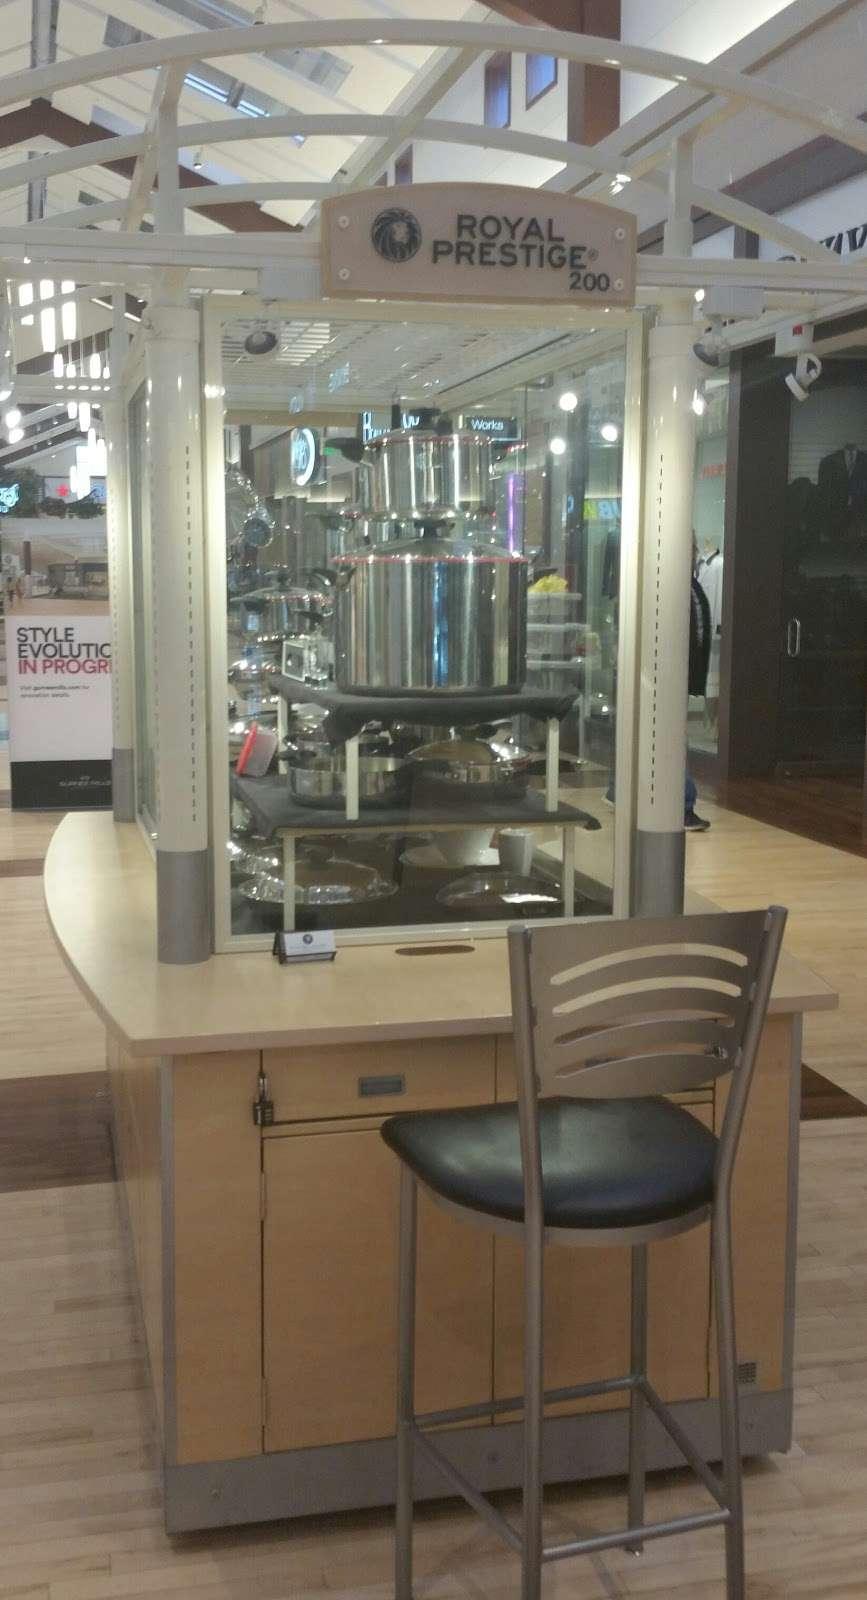 Royal Prestige - furniture store  | Photo 1 of 2 | Address: 1400 Sunset Ave, Waukegan, IL 60087, USA | Phone: (224) 237-4870